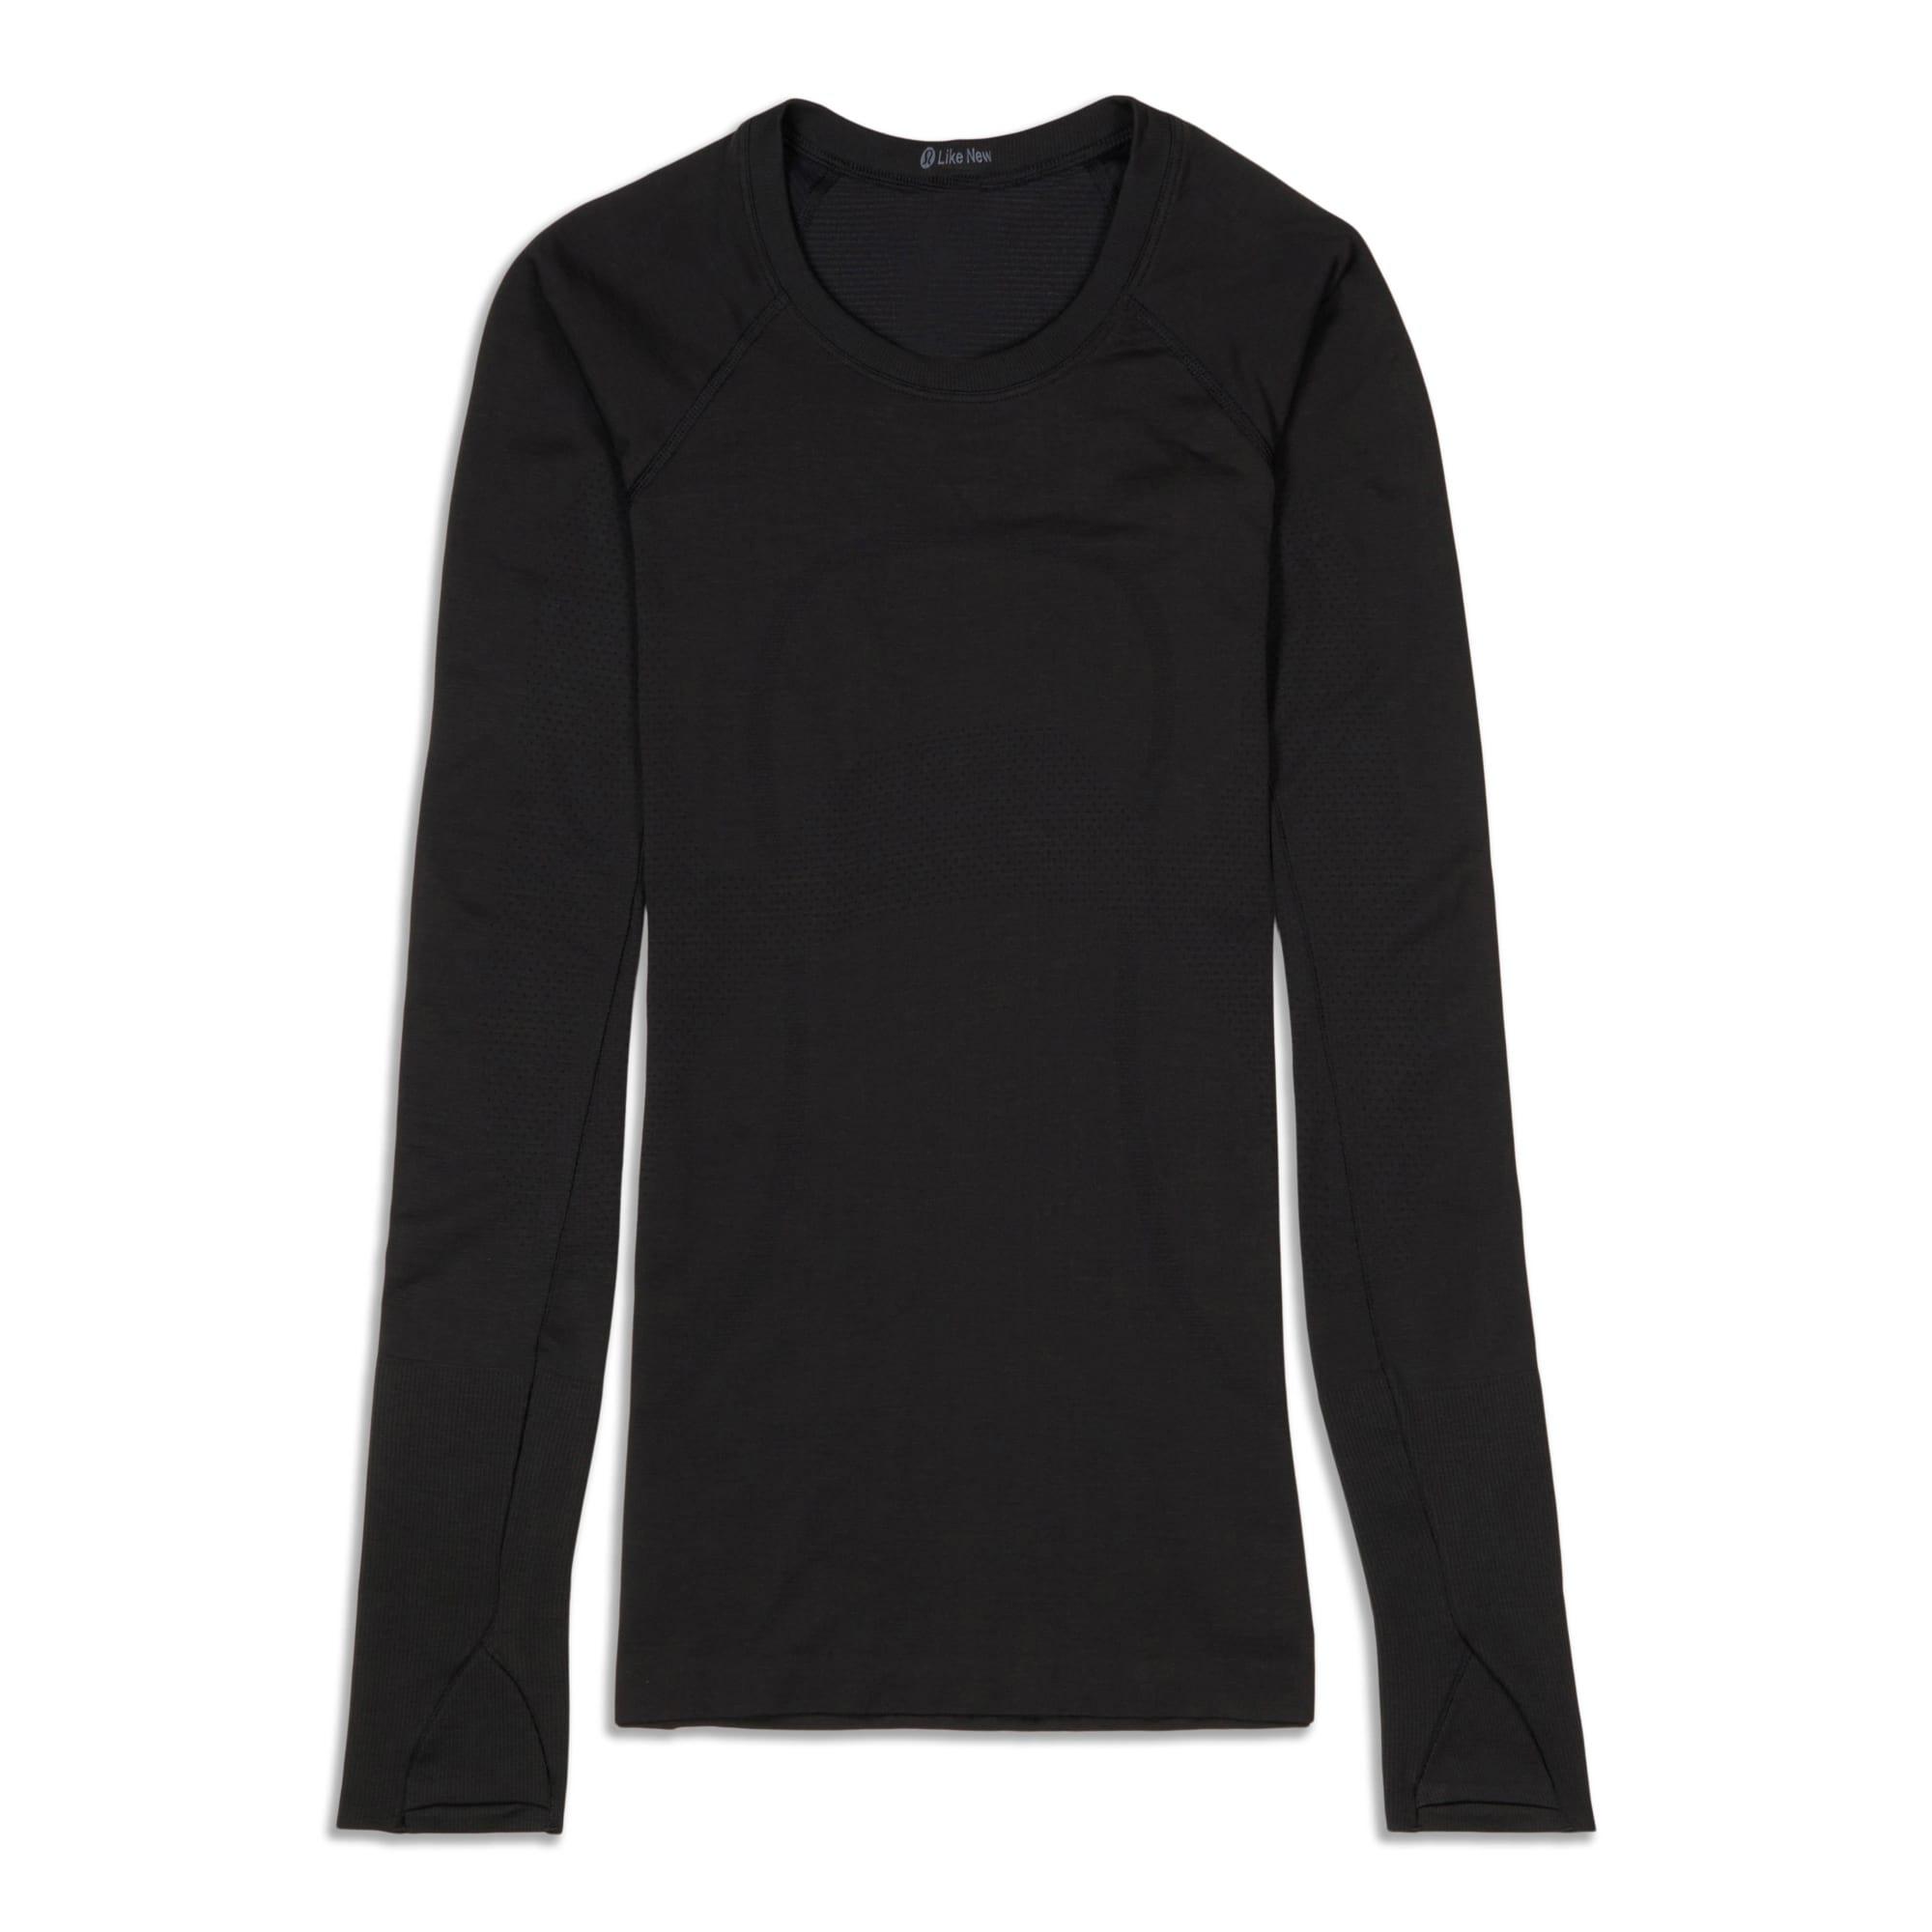 Main product image: Swiftly Tech Long Sleeve Shirt - Resale